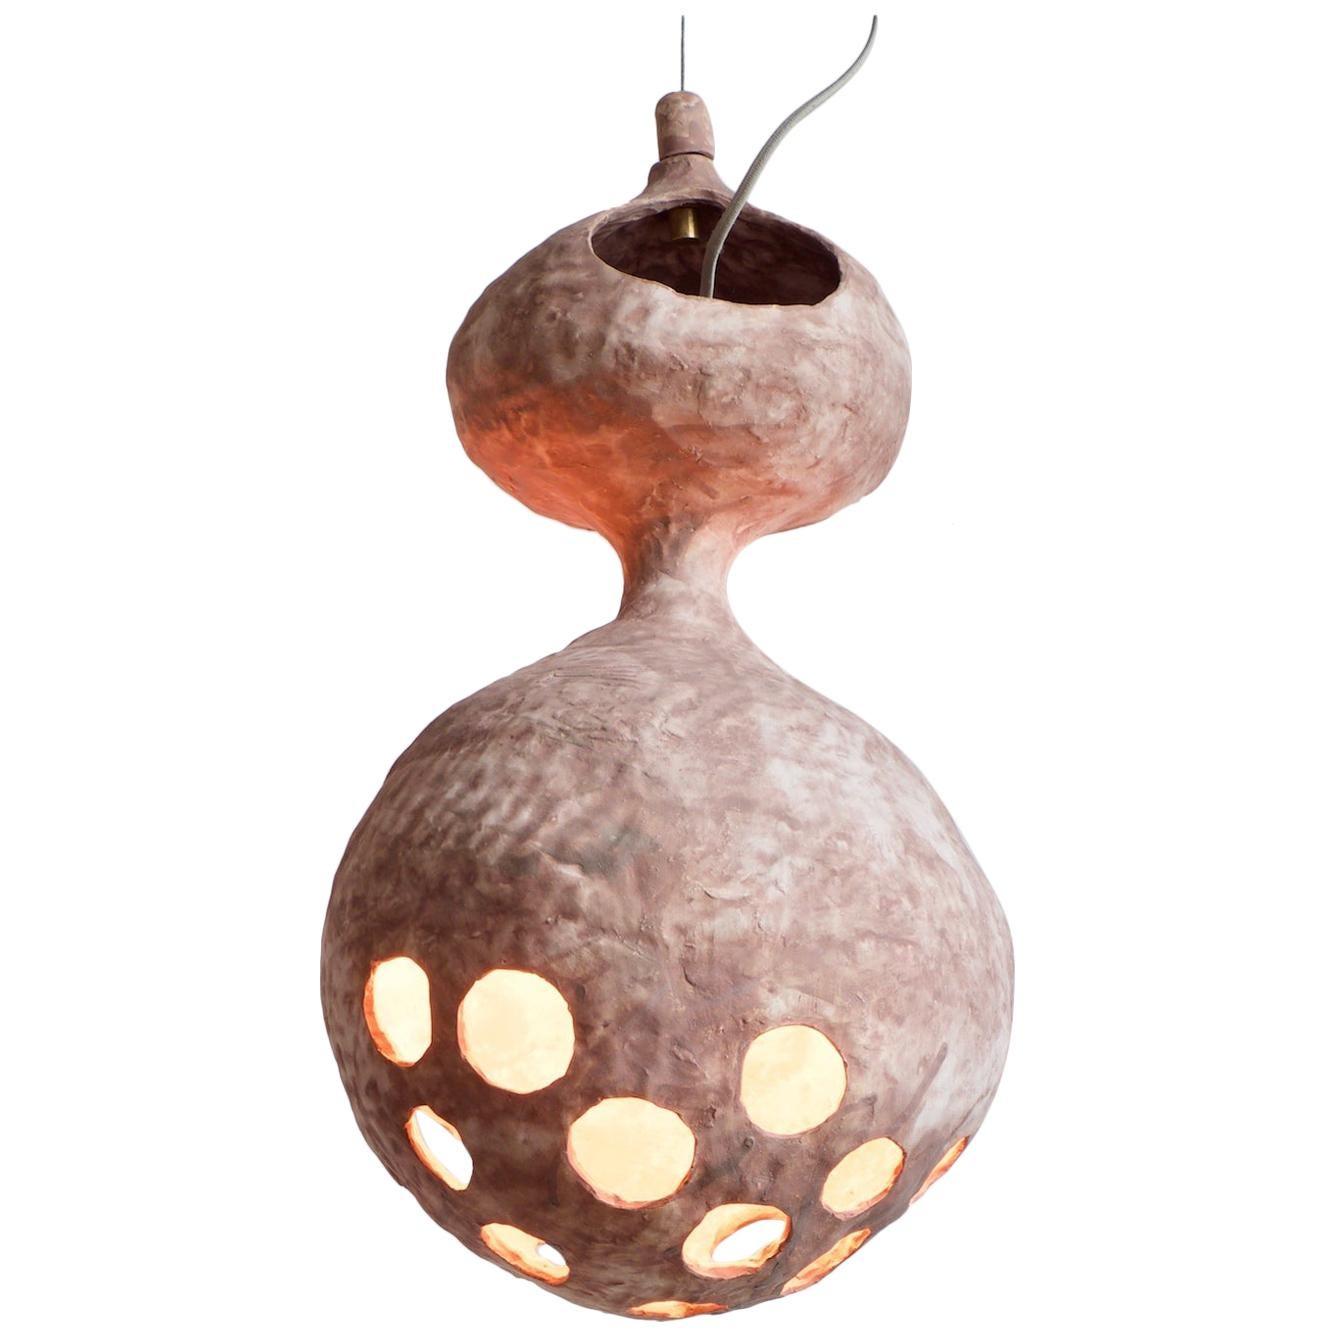 Sculptural Hand-Built Ceramic Pendant Lamp in Matte Earth-Tone by Yuko Nishikawa